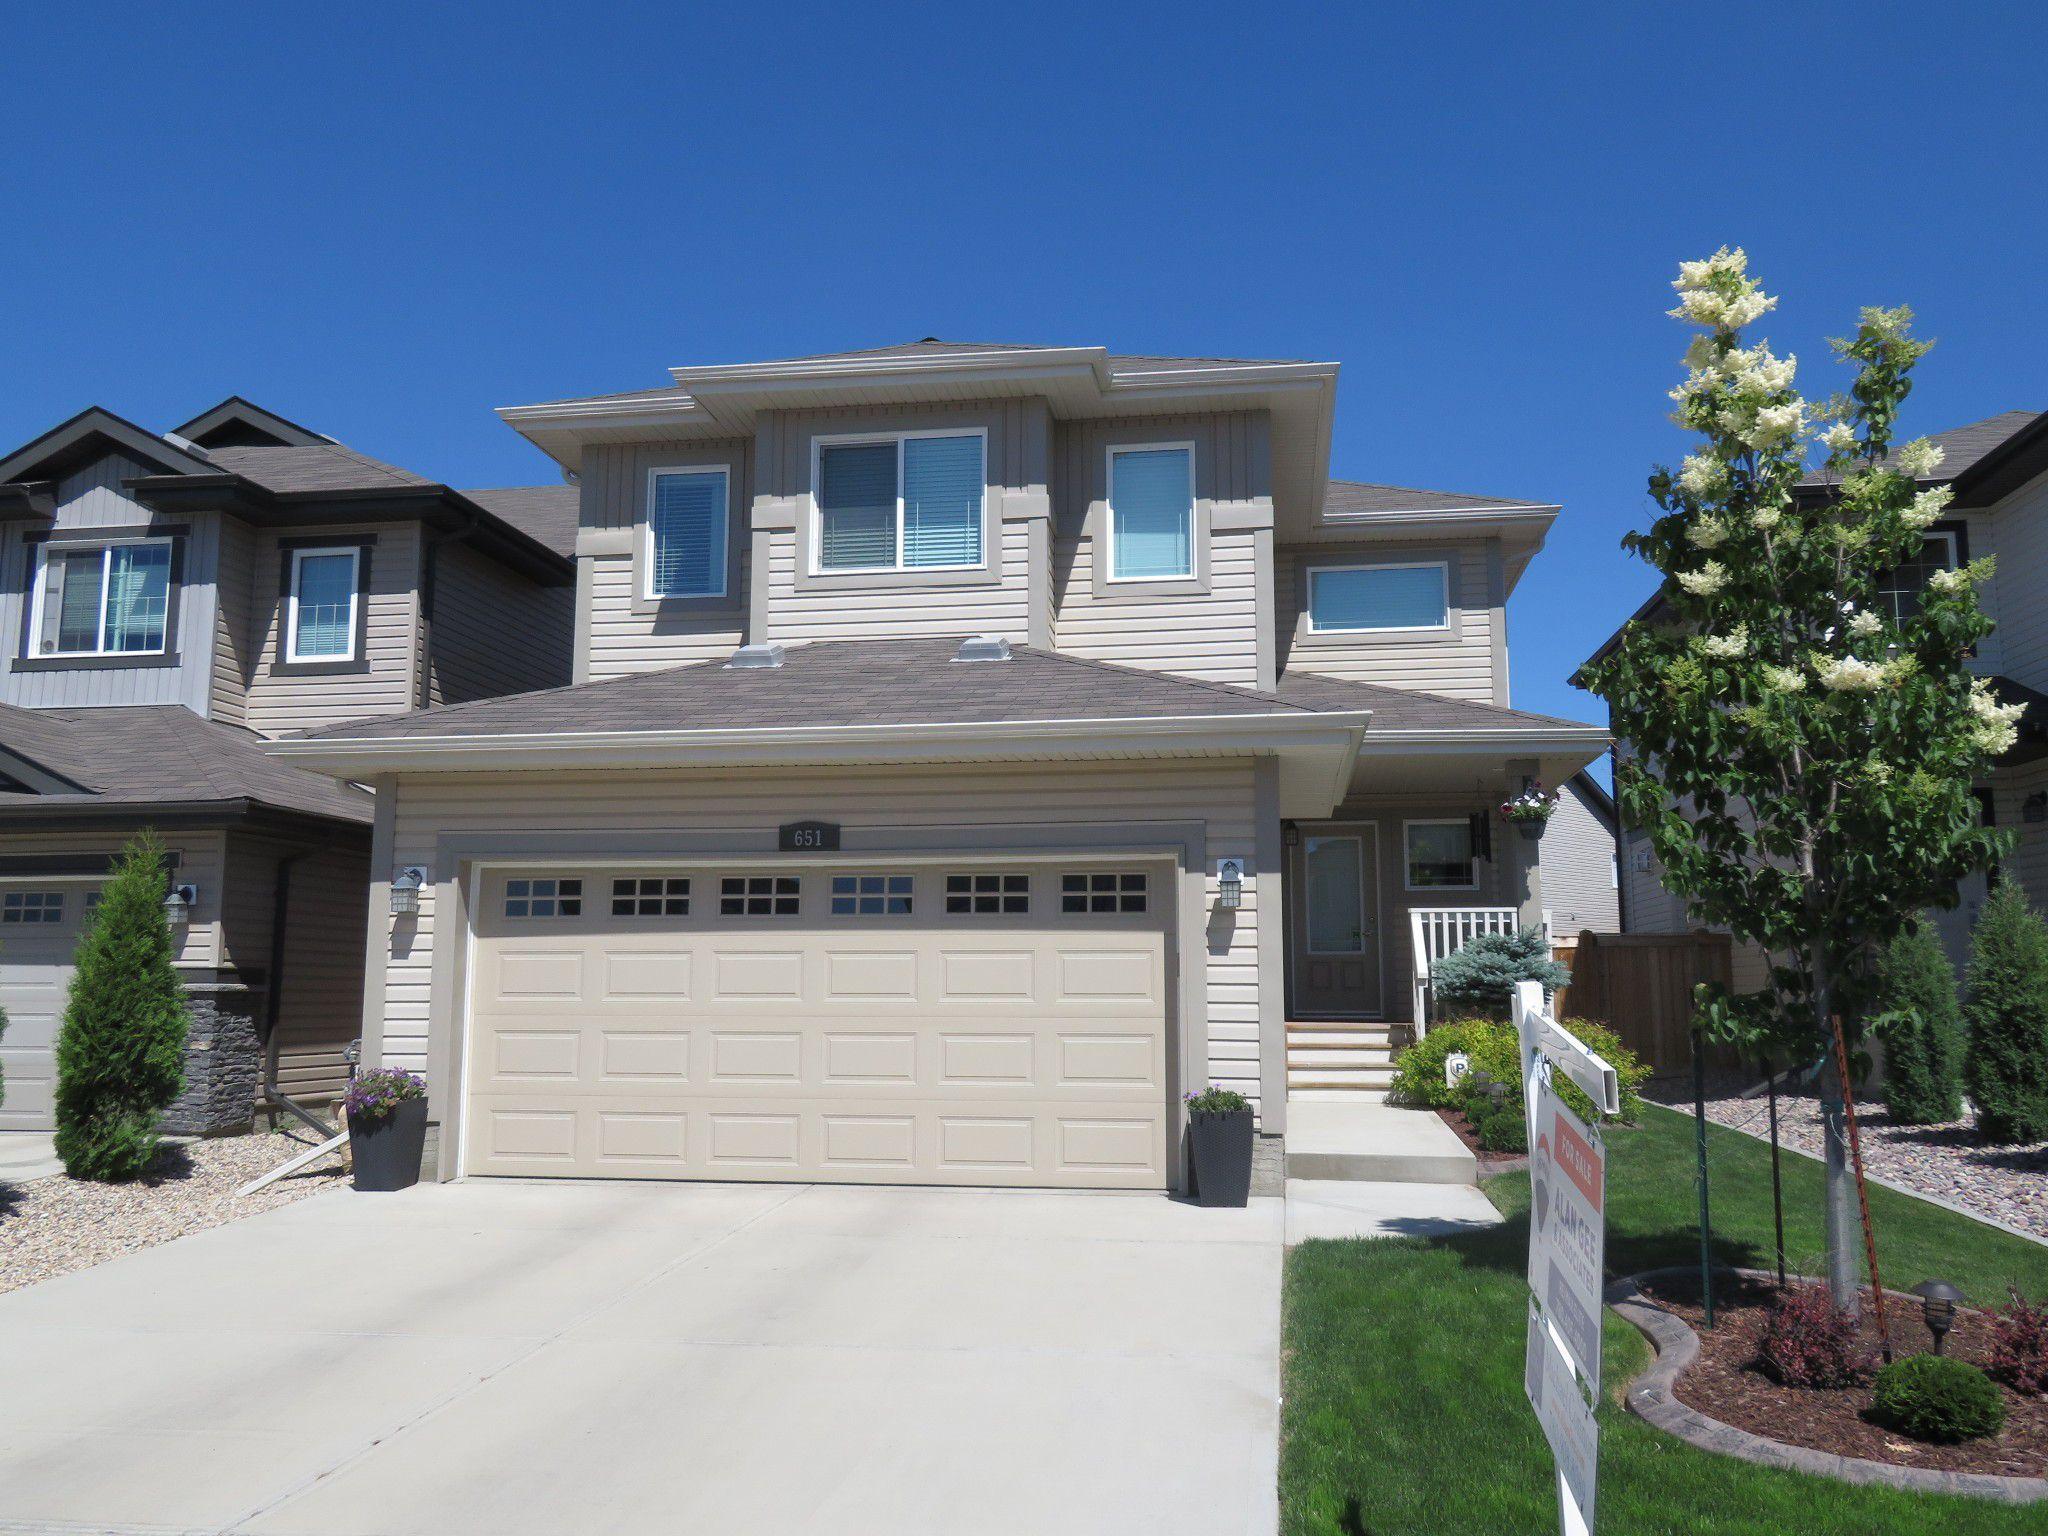 Main Photo: 651 178 Street SW in EDMONTON: House for sale (Edmonton)